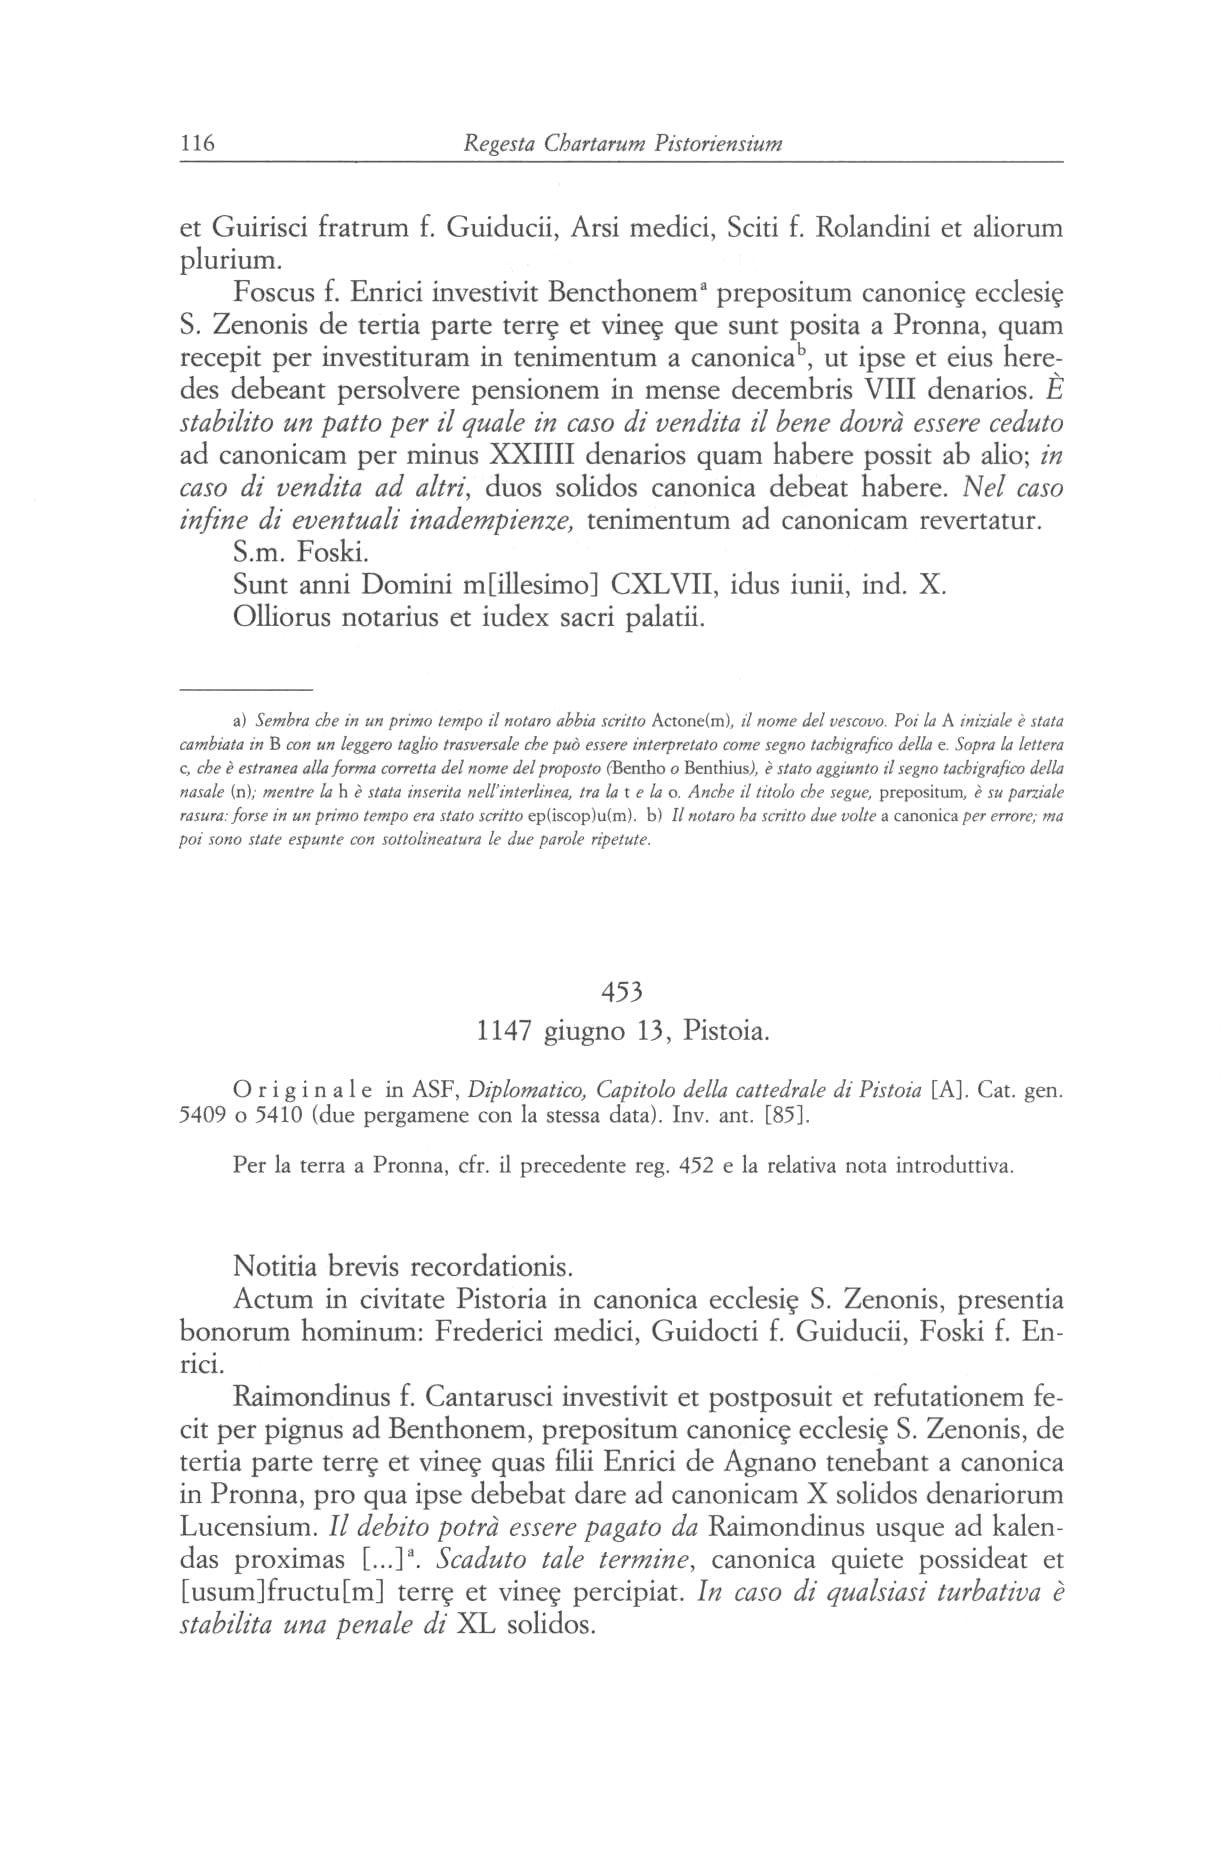 Canonica S. Zenone XII 0116.jpg